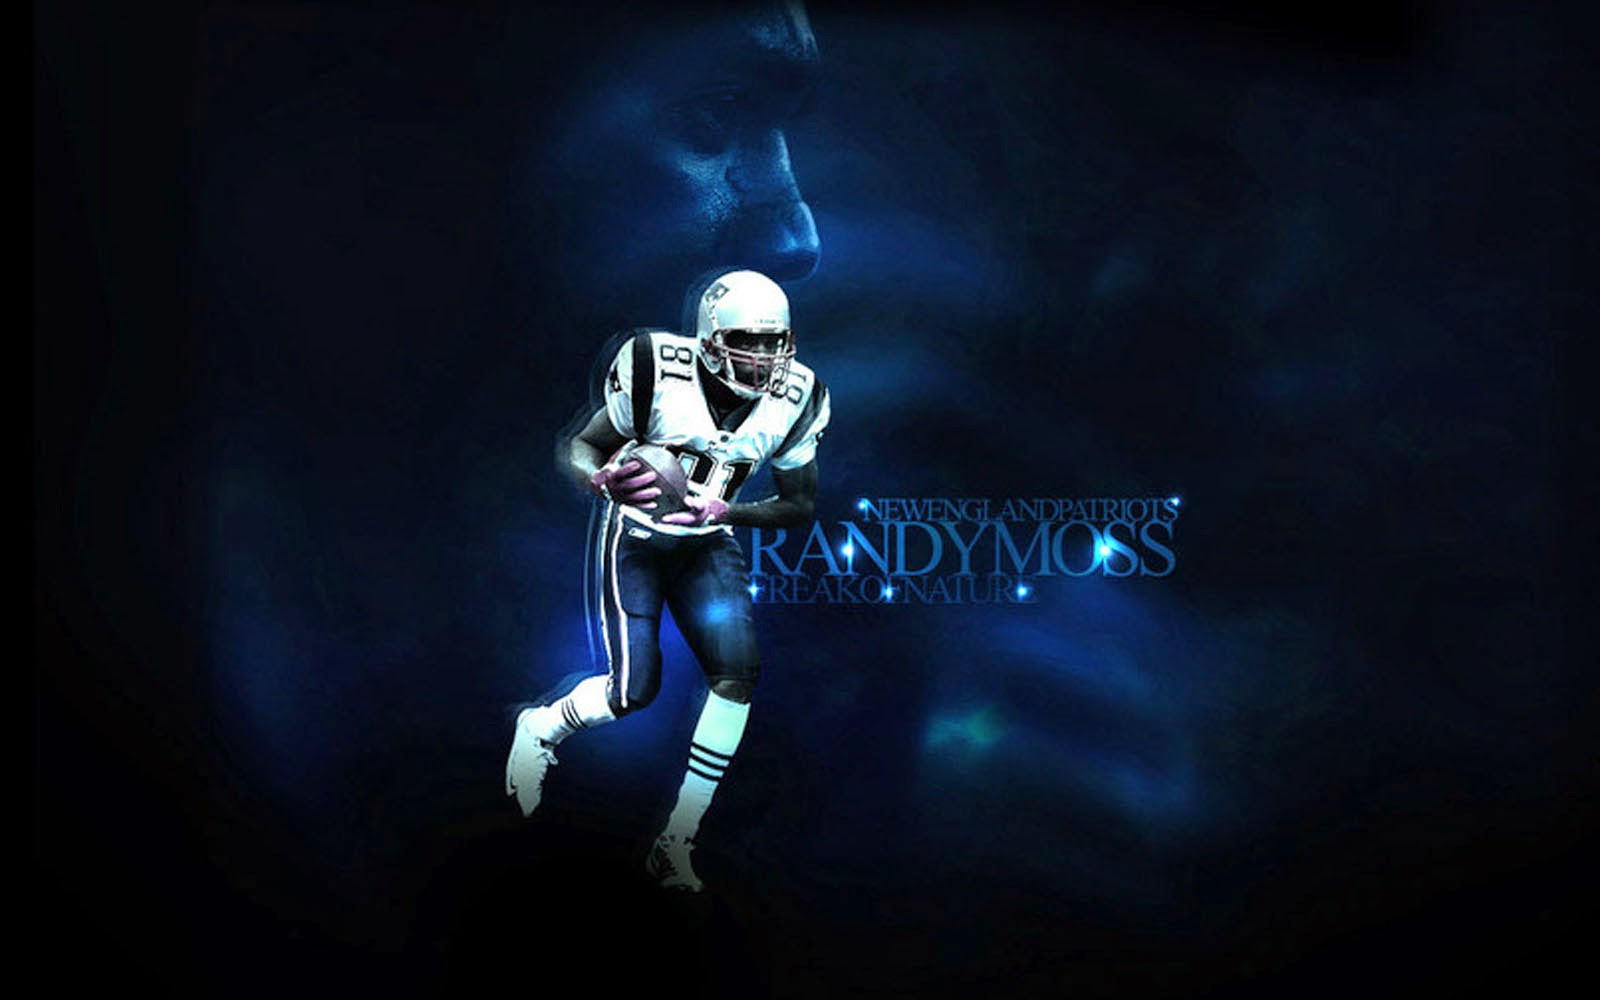 American Football Backgrounds Desktop: Wallpapers: American Football Player Randy Moss Wallpapers